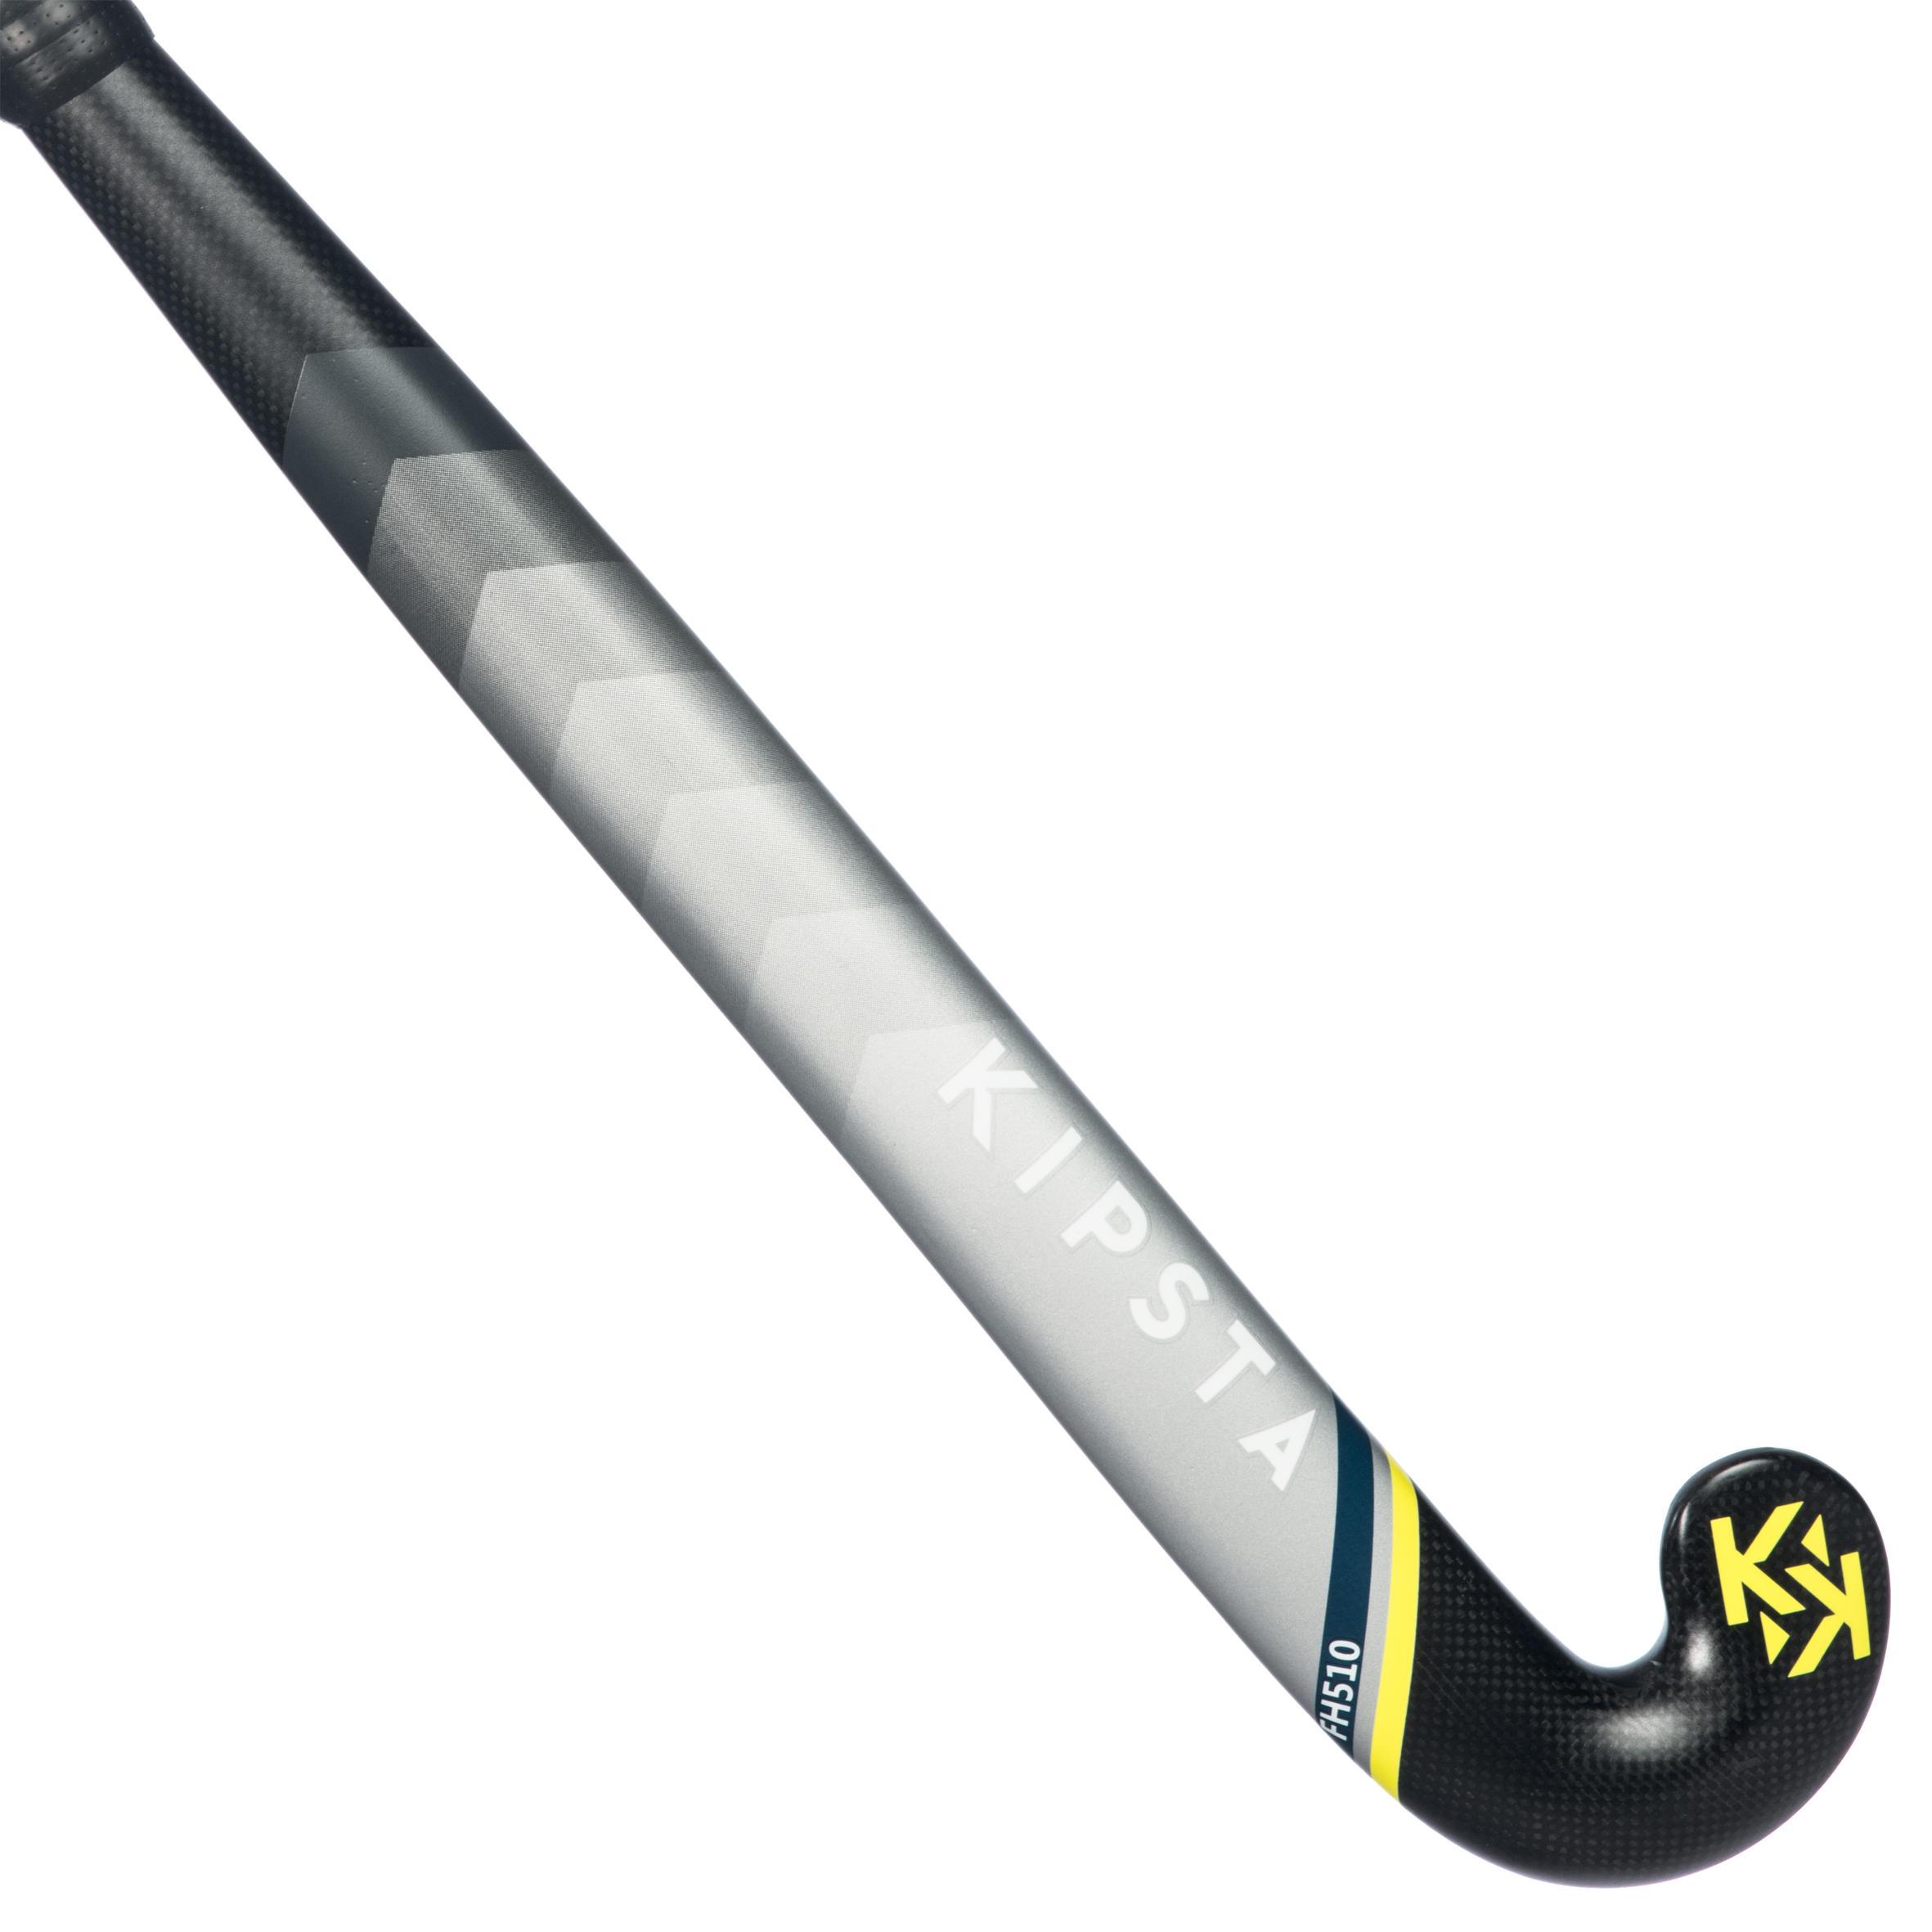 Stick de hockey sur gazon adulte confirmé lowbow 50 carbone fh510 jaune korok